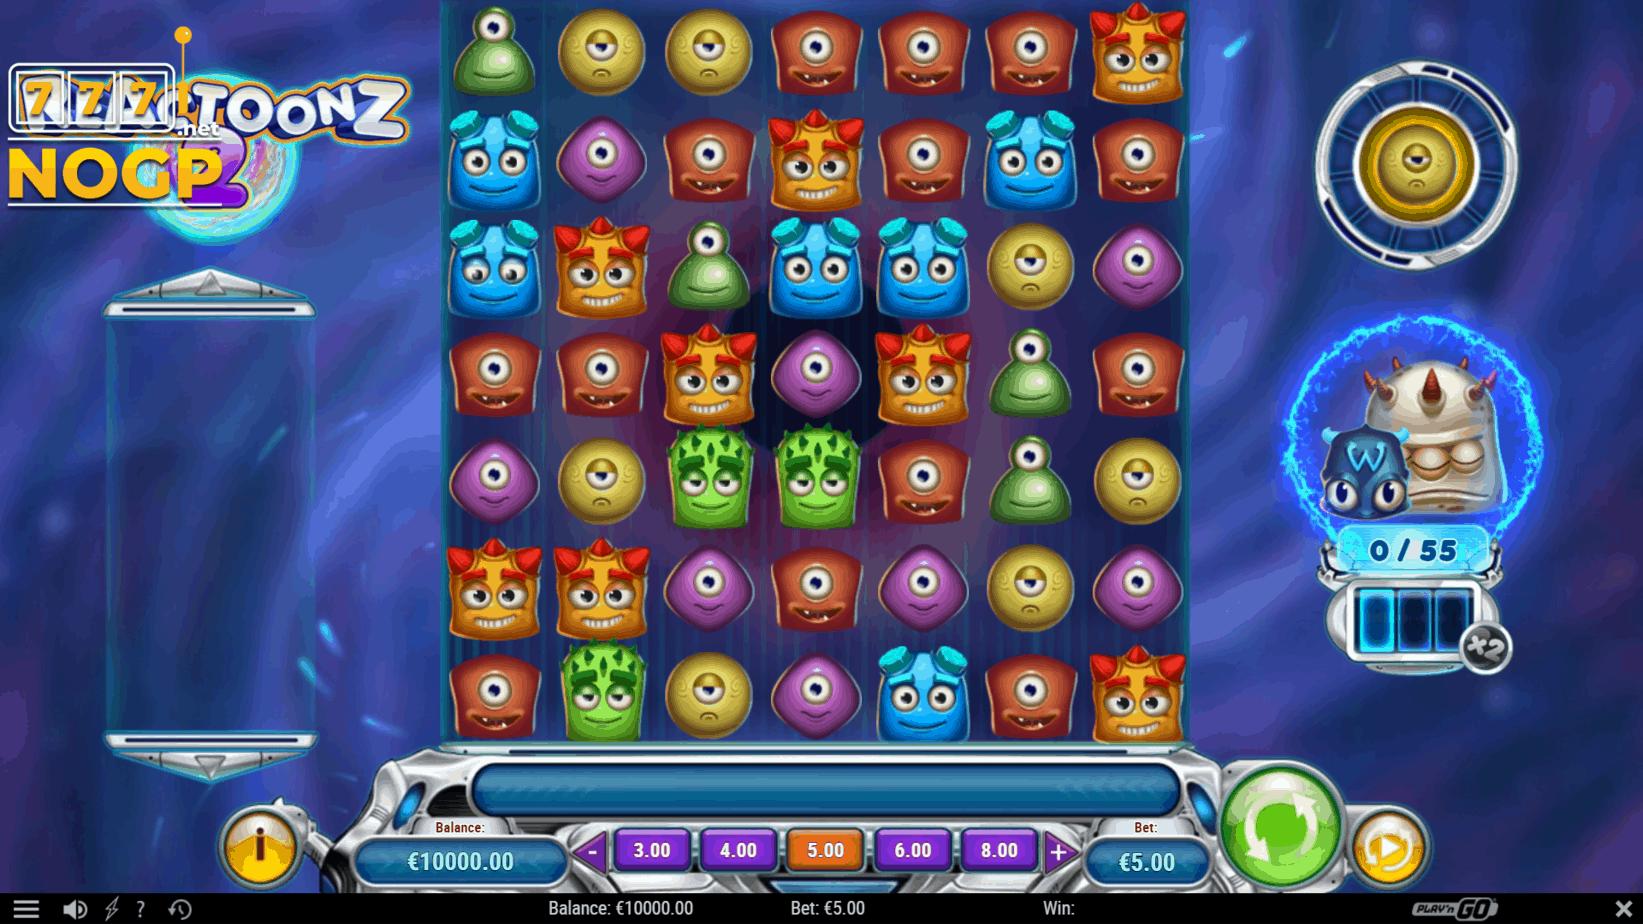 Play'n GO's Reactoonz 2 slot